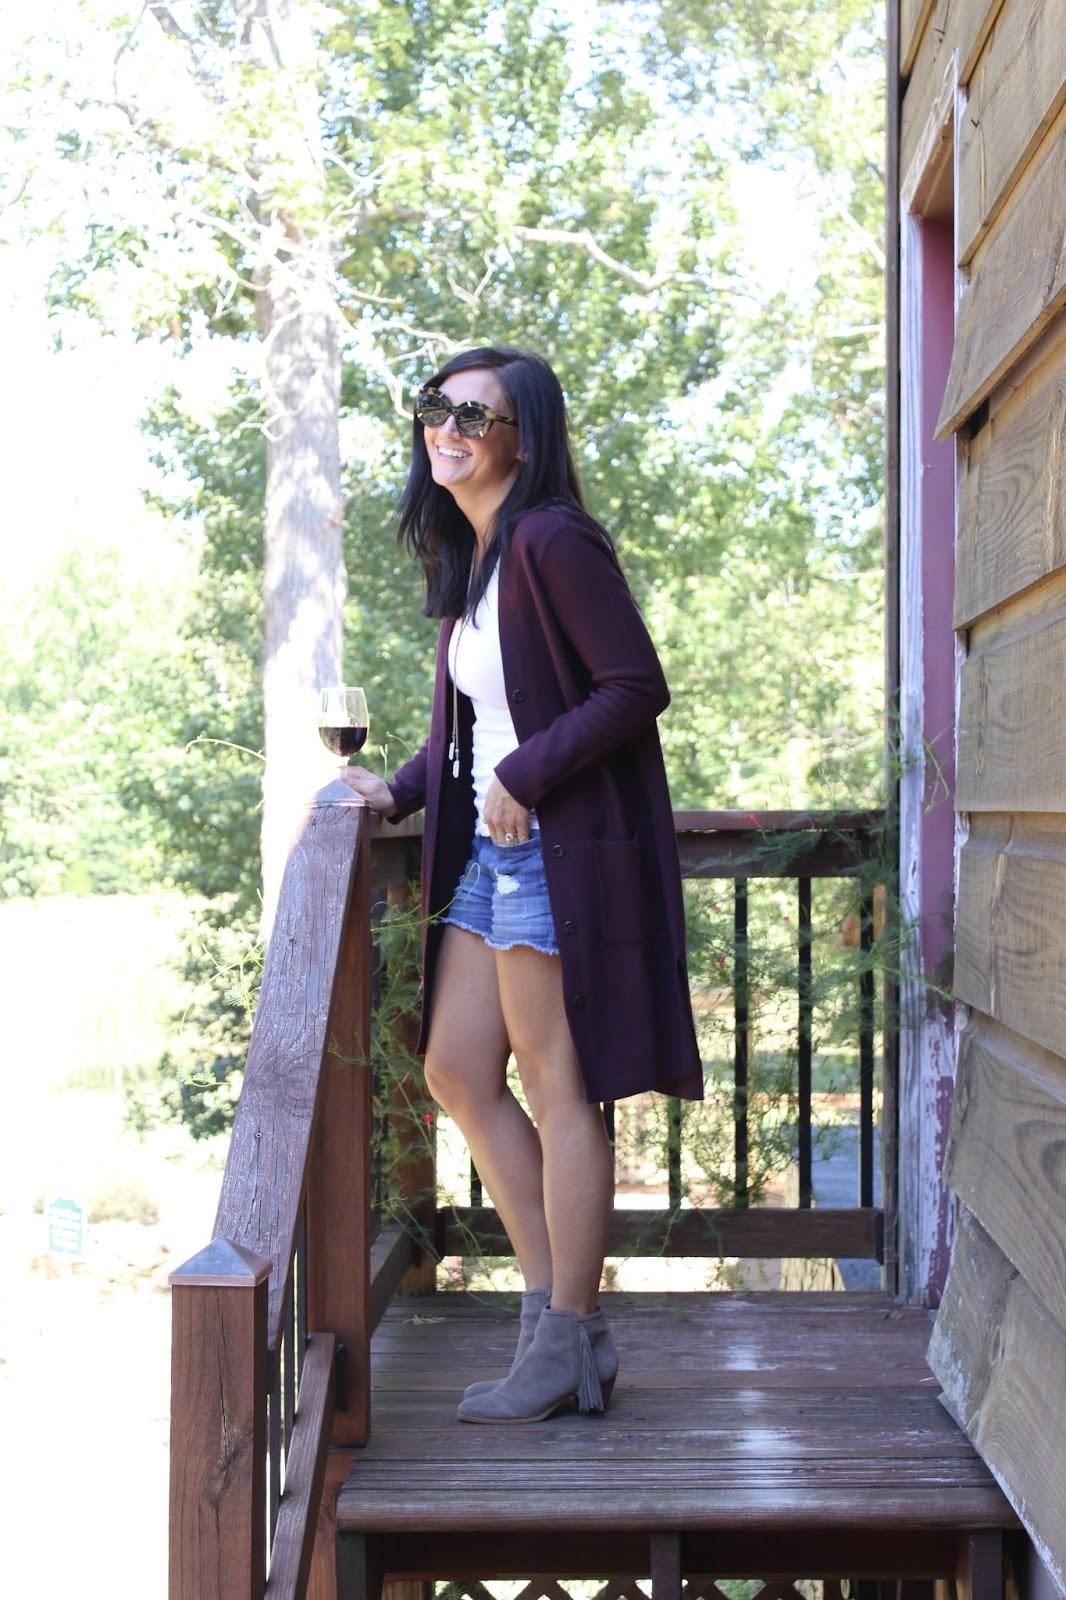 Daveste Vineyards, J Jill cardigan, tassel booties, fall layering